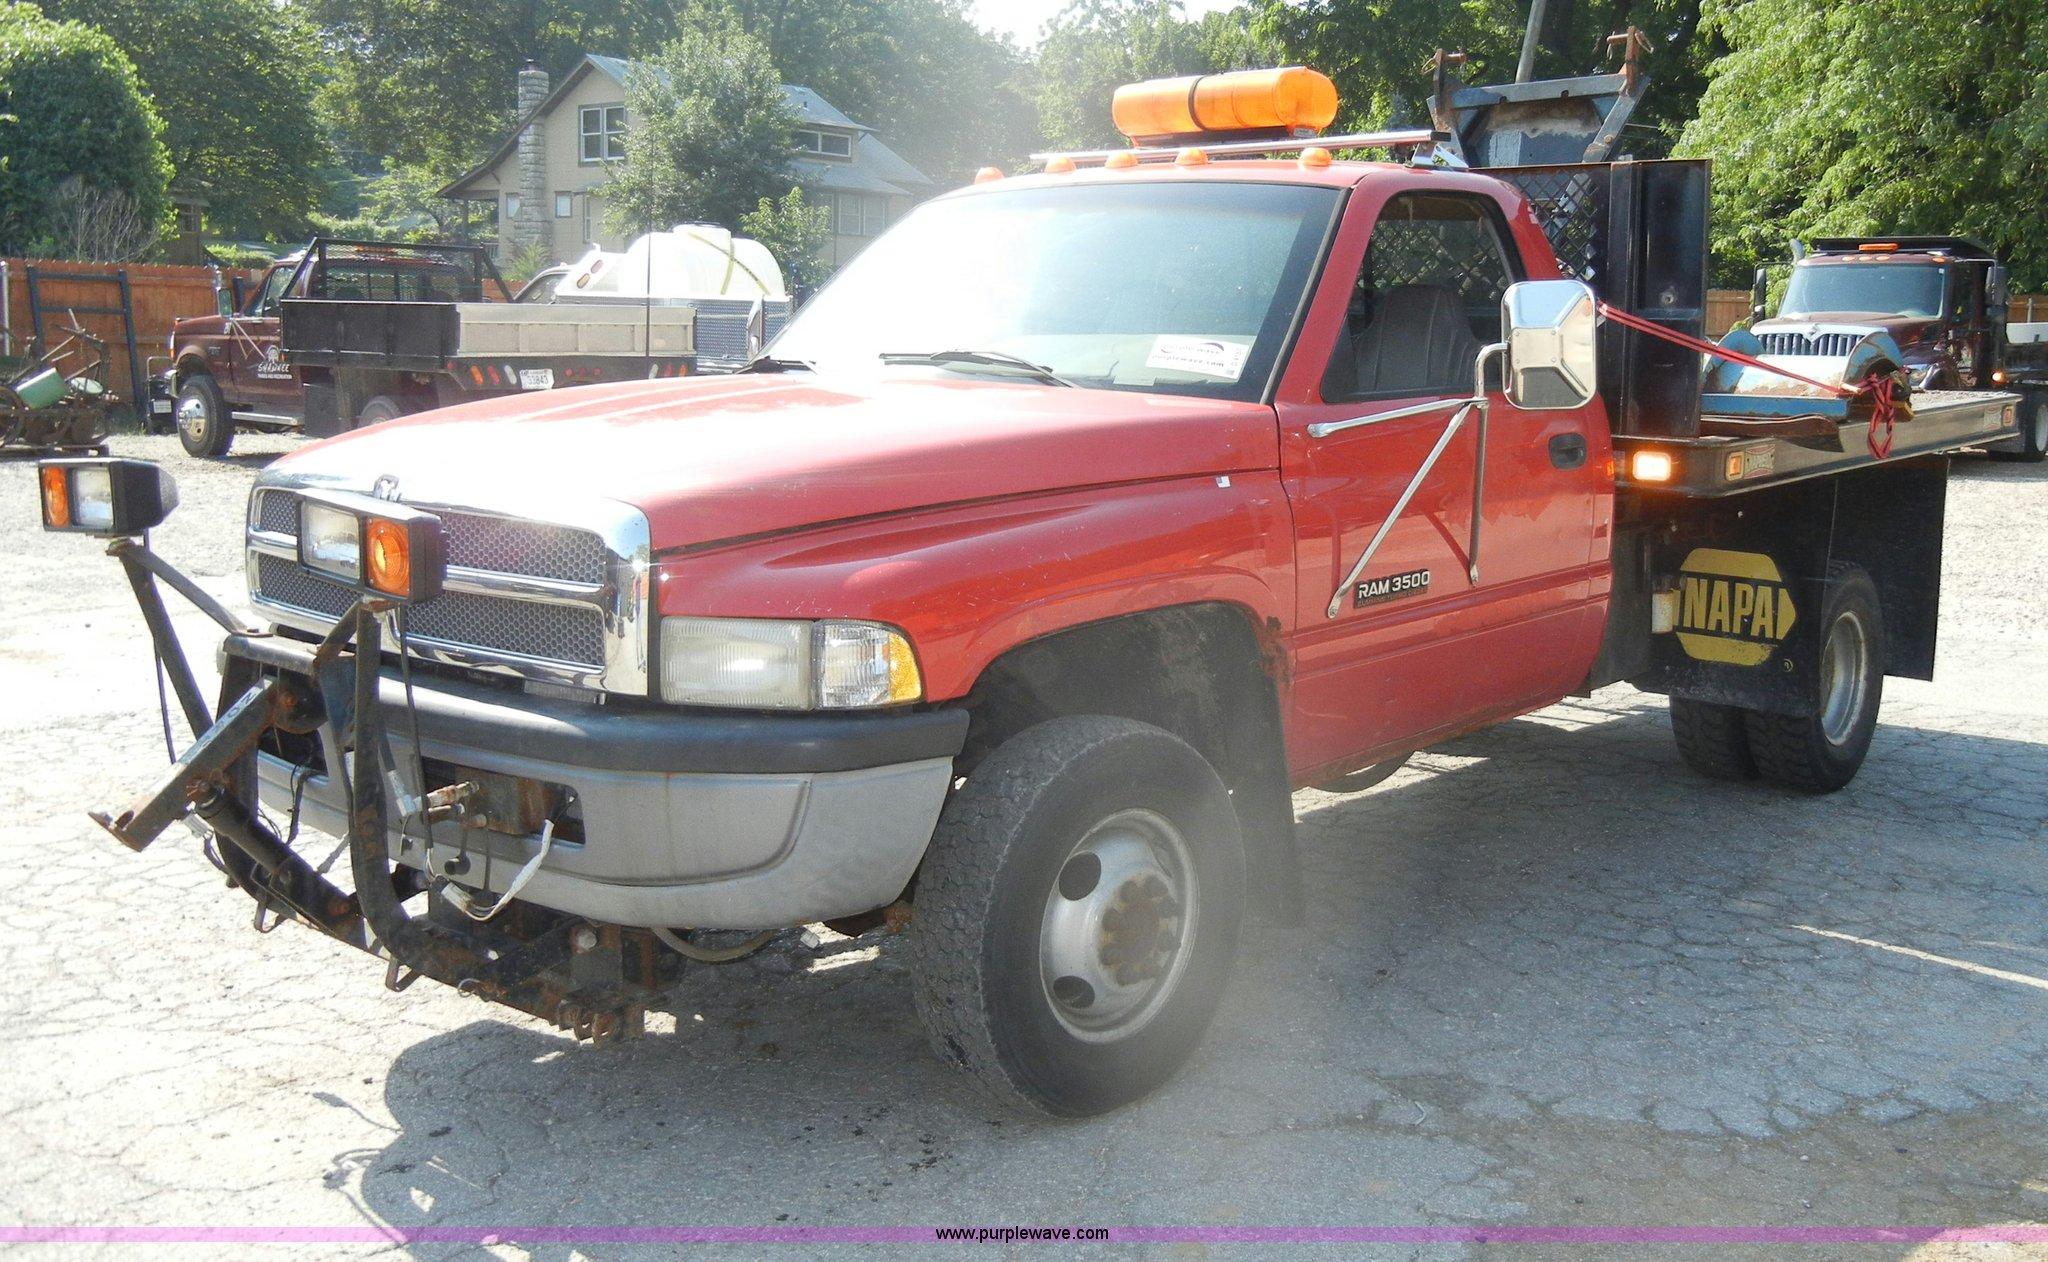 1996 dodge ram 3500 flatbed pickup truck in shawnee ks item d4157 sold purple wave 1996 dodge ram 3500 flatbed pickup